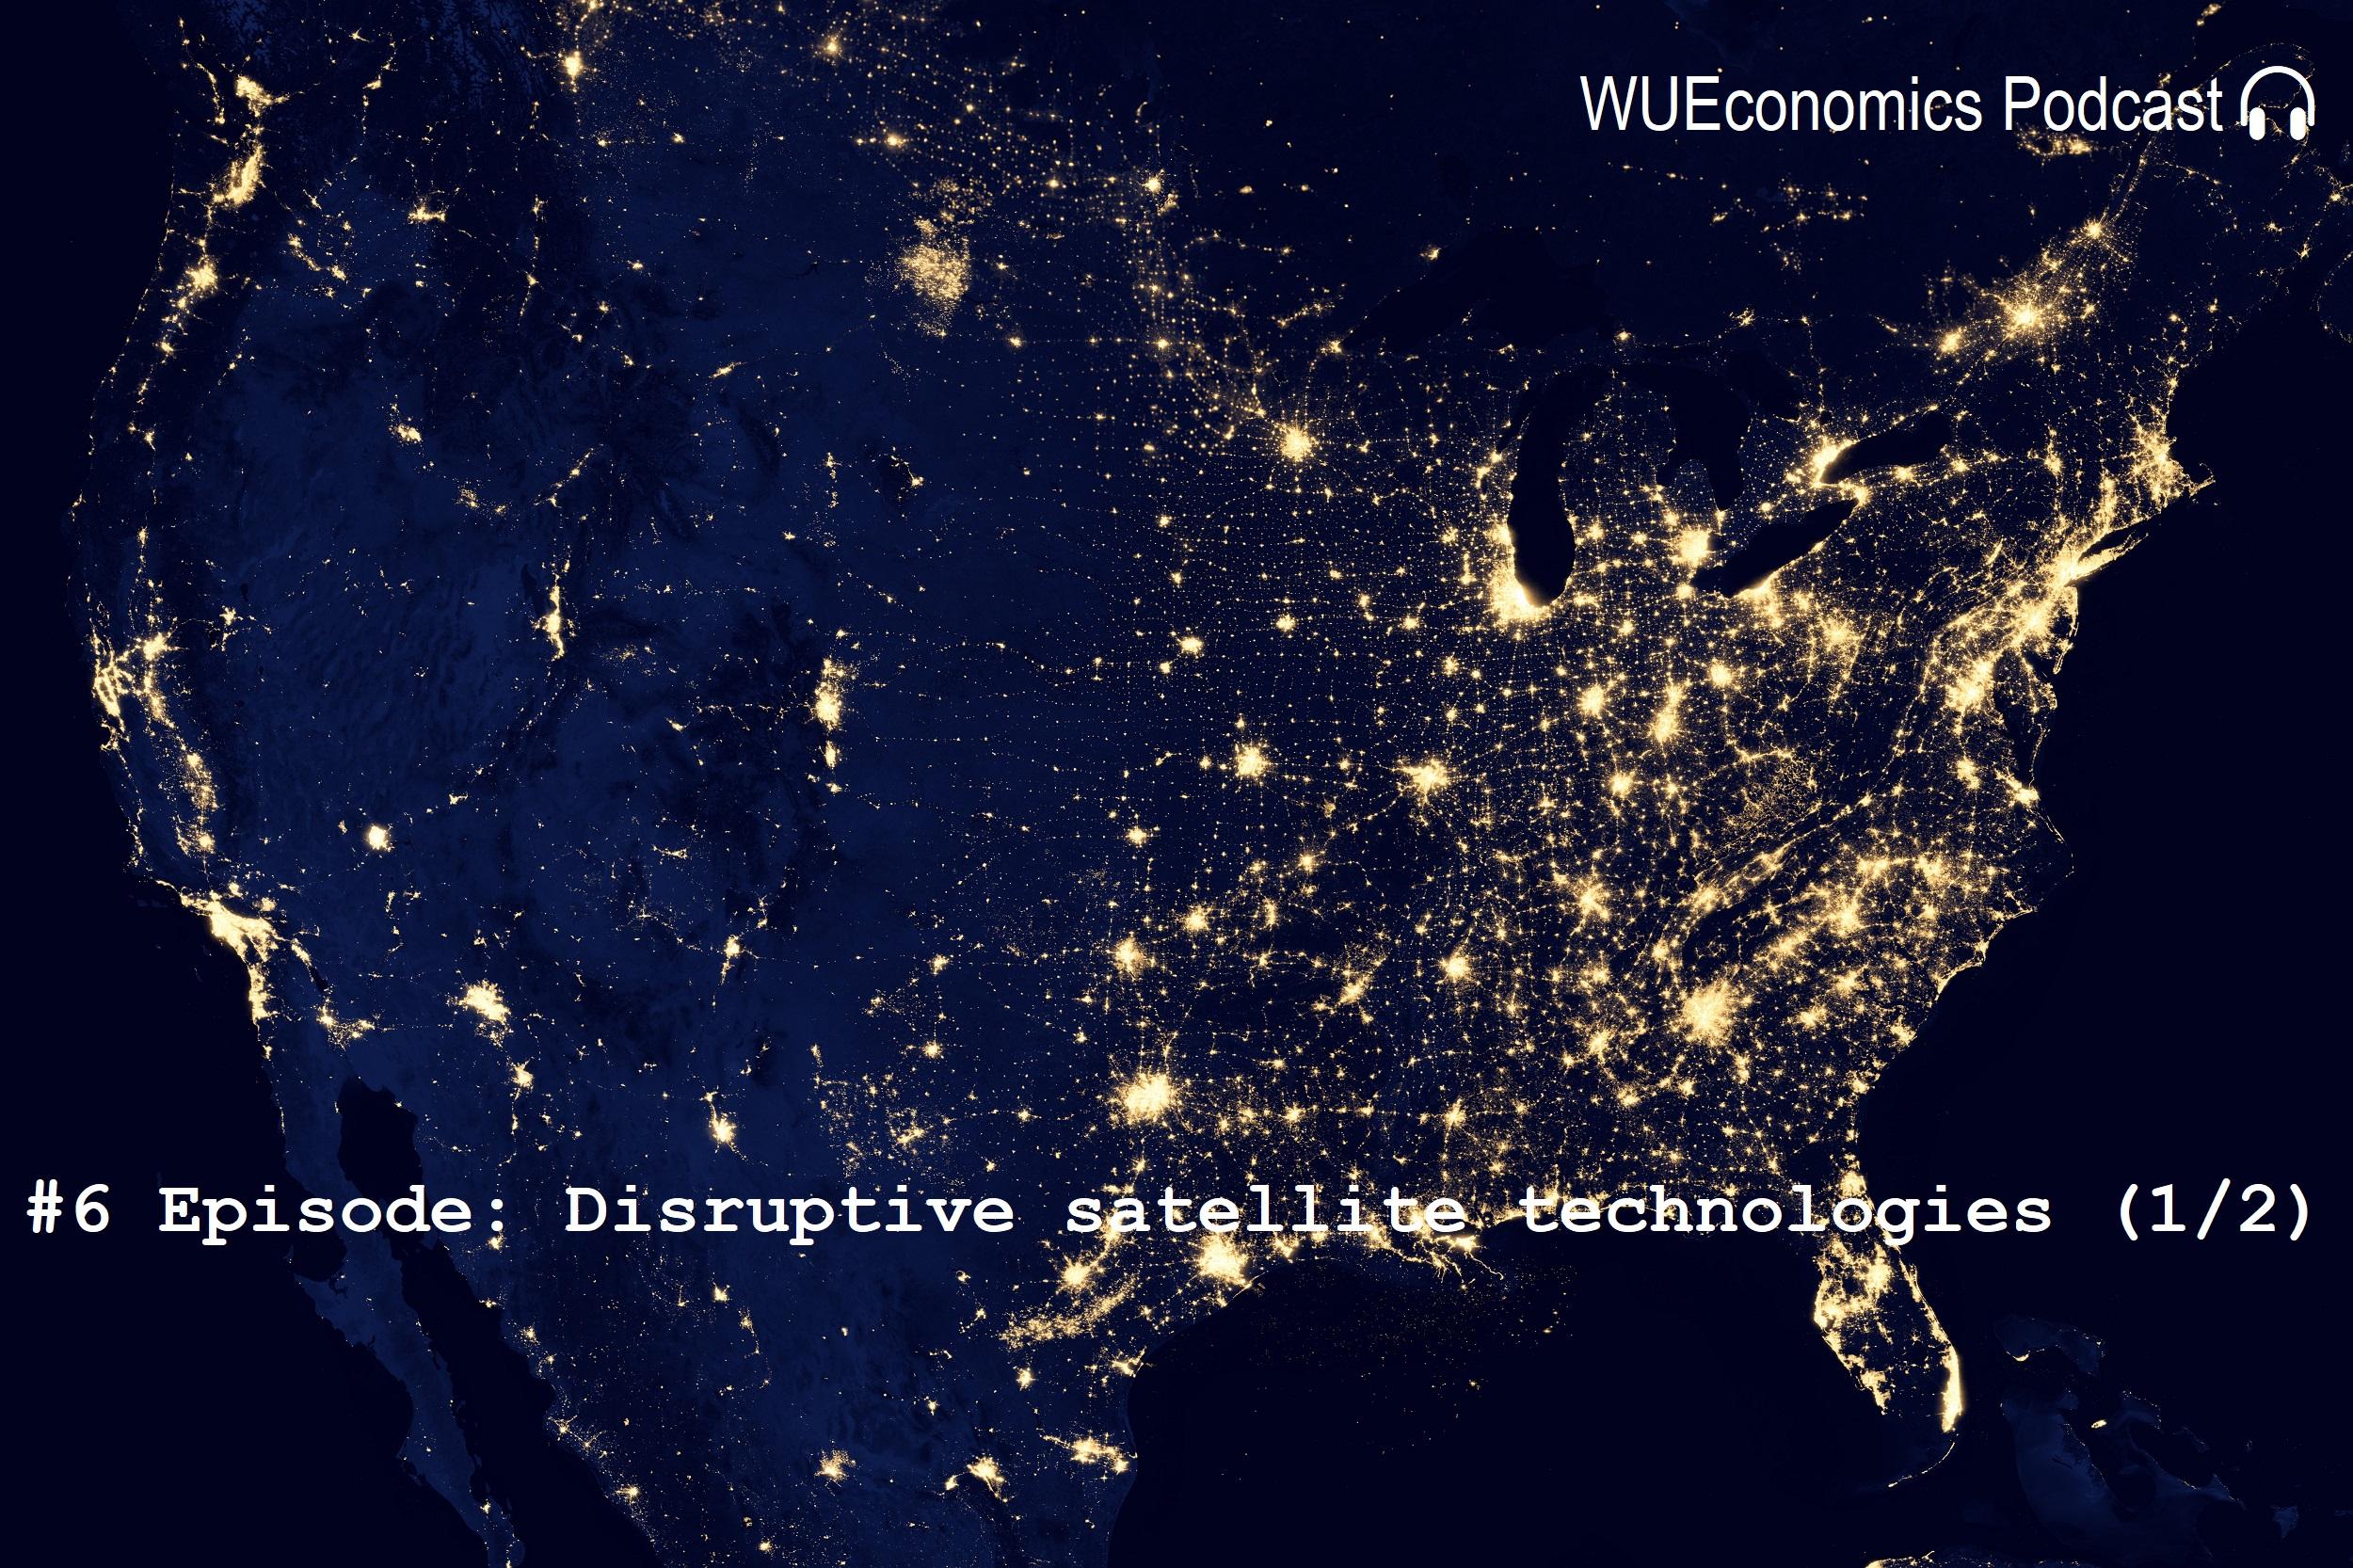 #6 Episode – Disruptive satellite technologies & Internet of Space